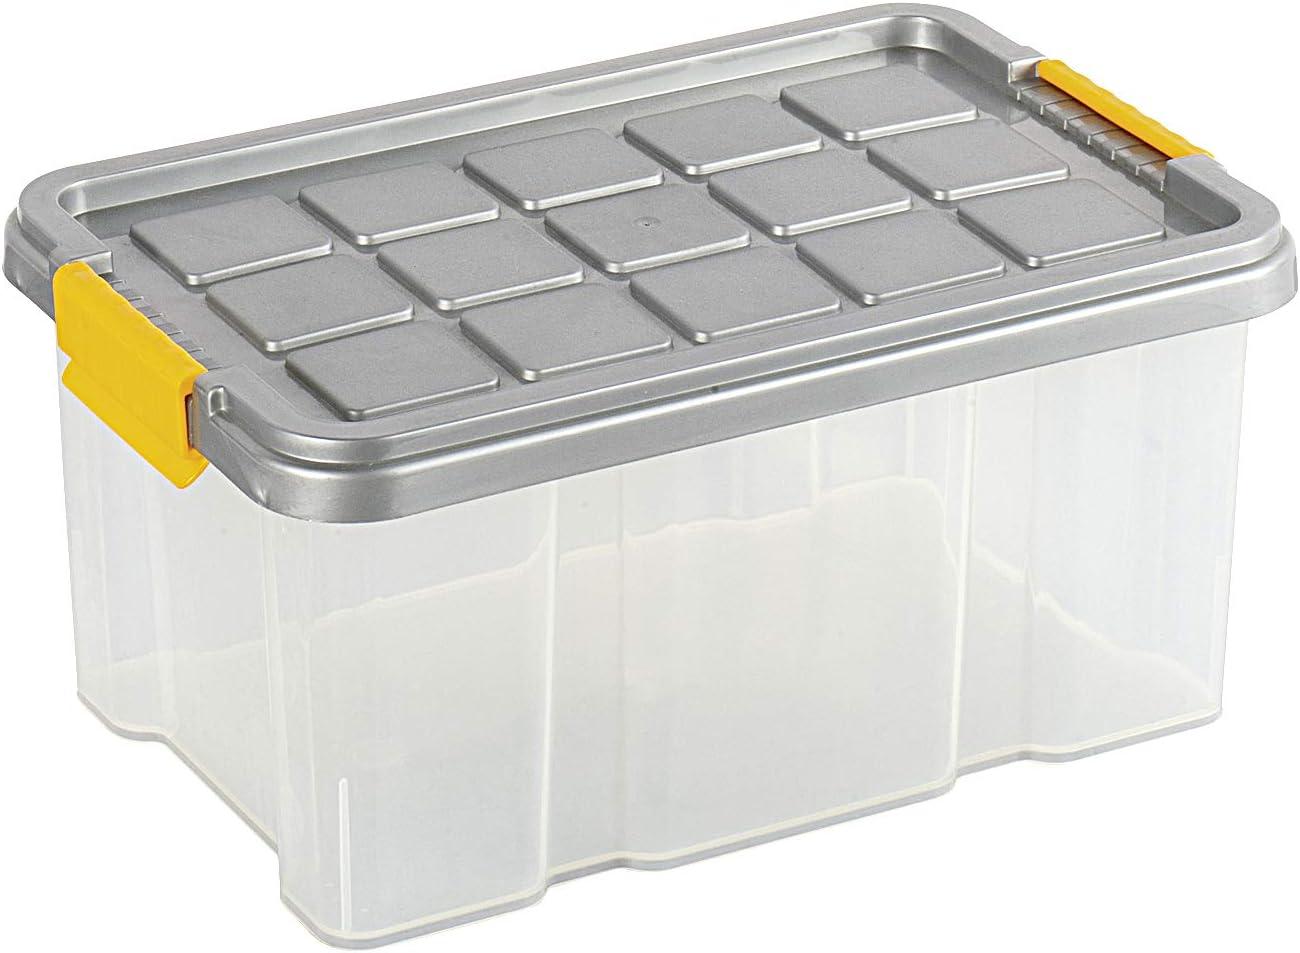 RIVAL Euro Cajas con Tapa (30 x 19 x 14 cm: Amazon.es: Hogar